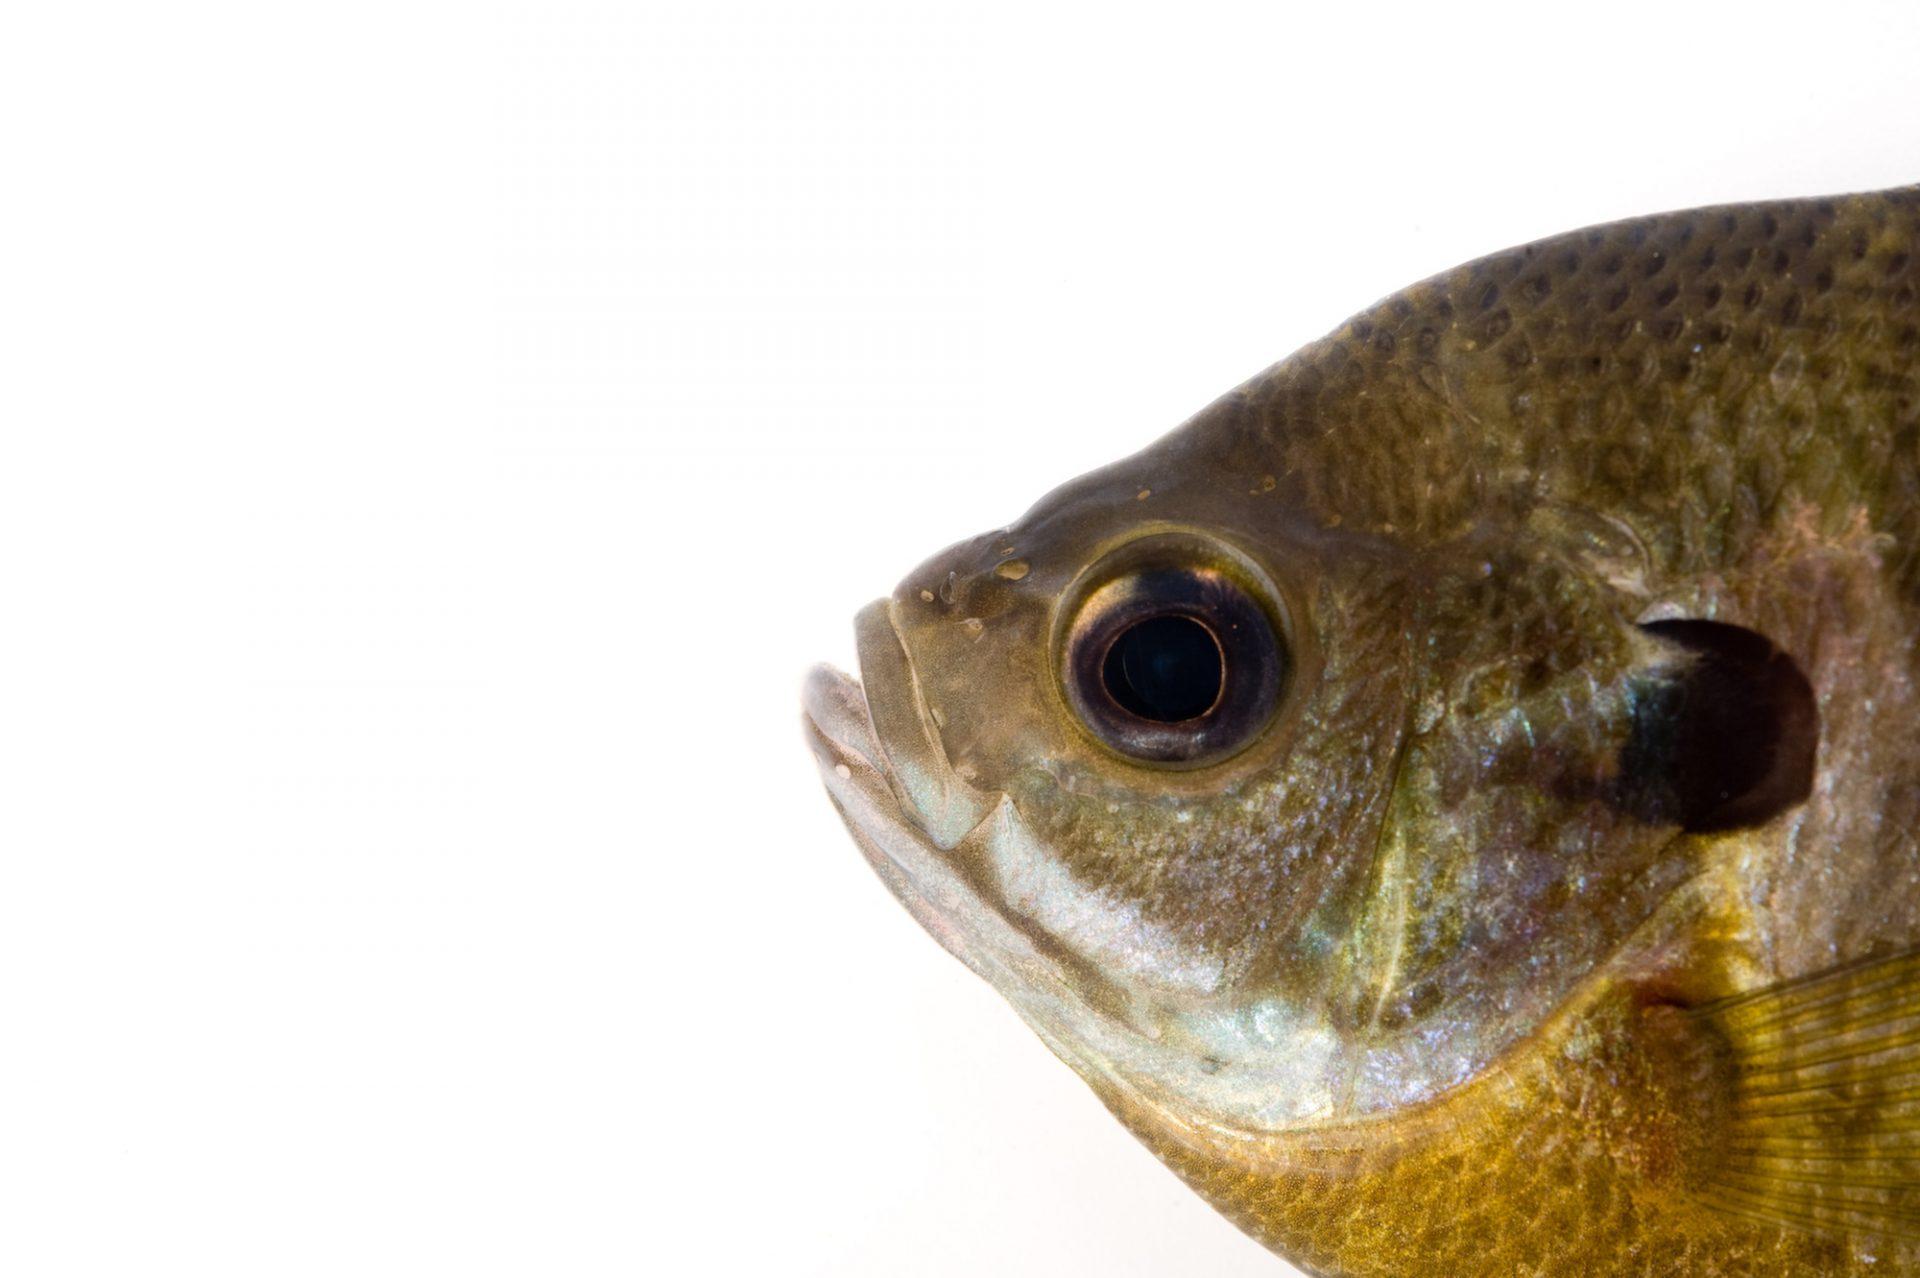 A bluegill (Lepomis macrochirus).